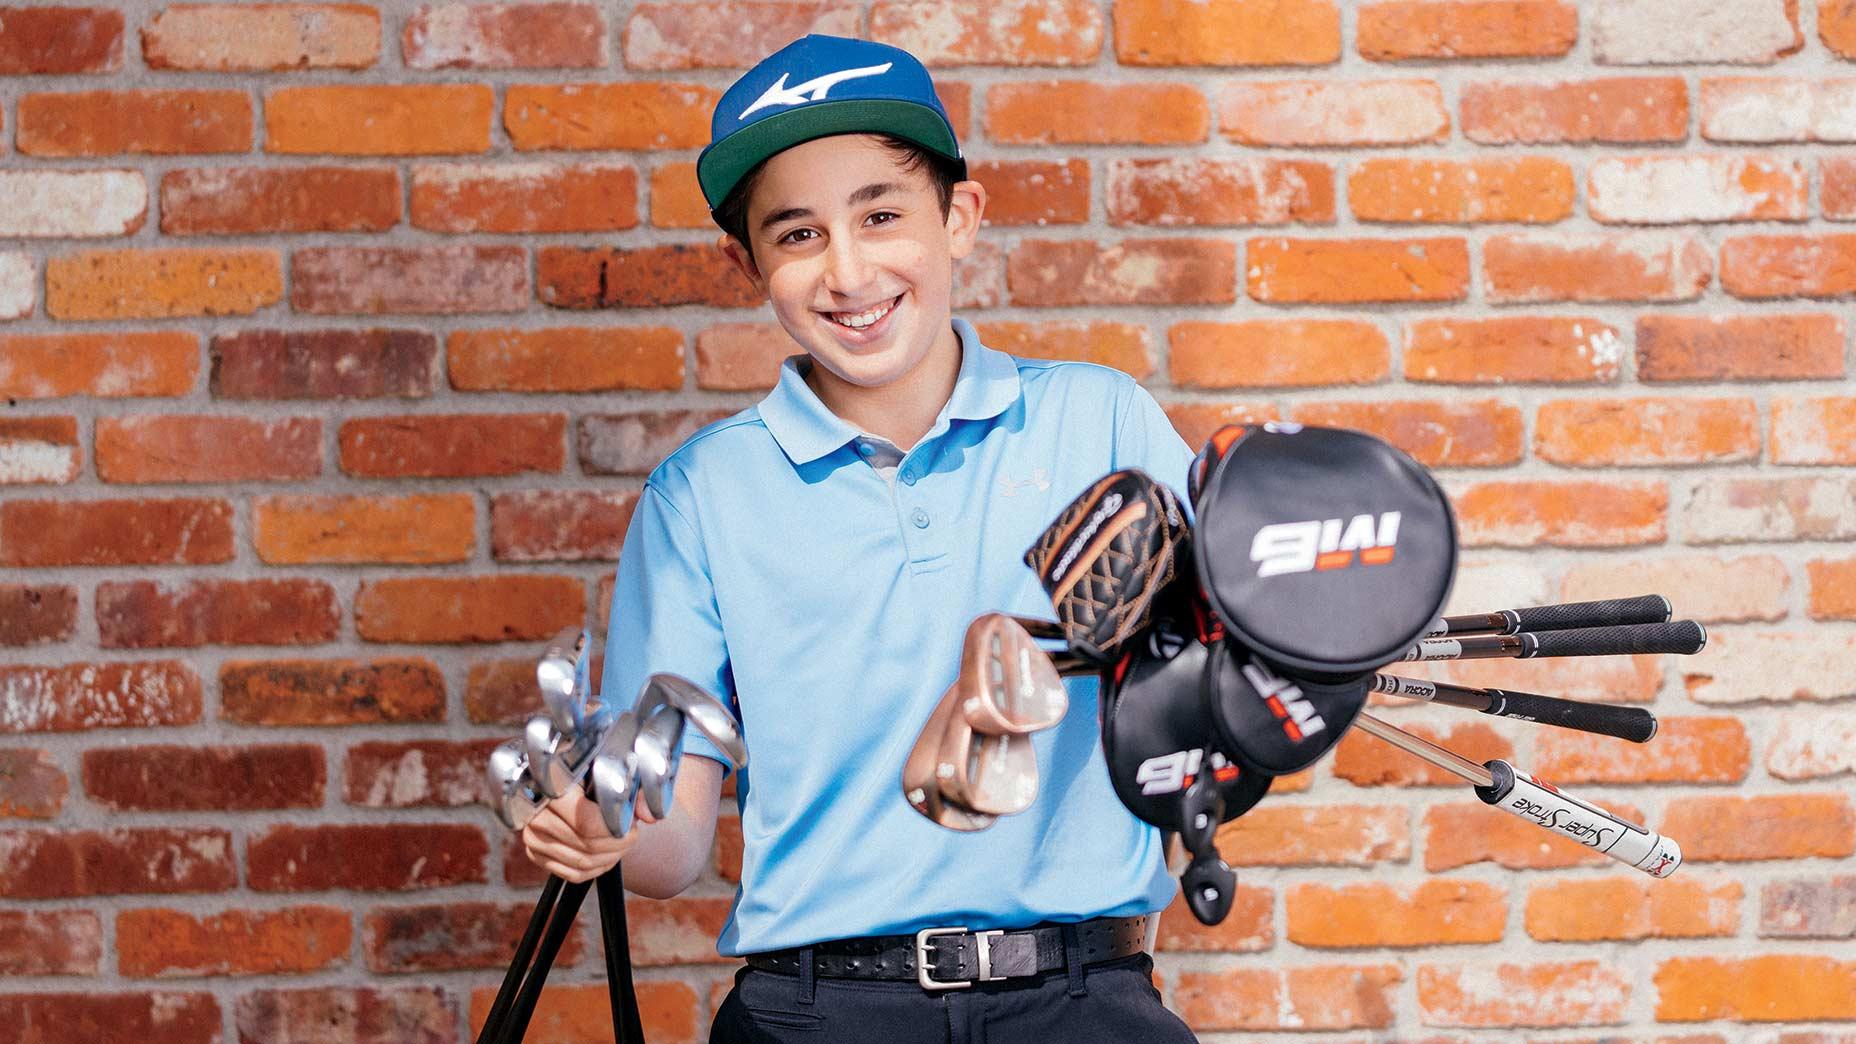 Ike Rothman with golf clubs.